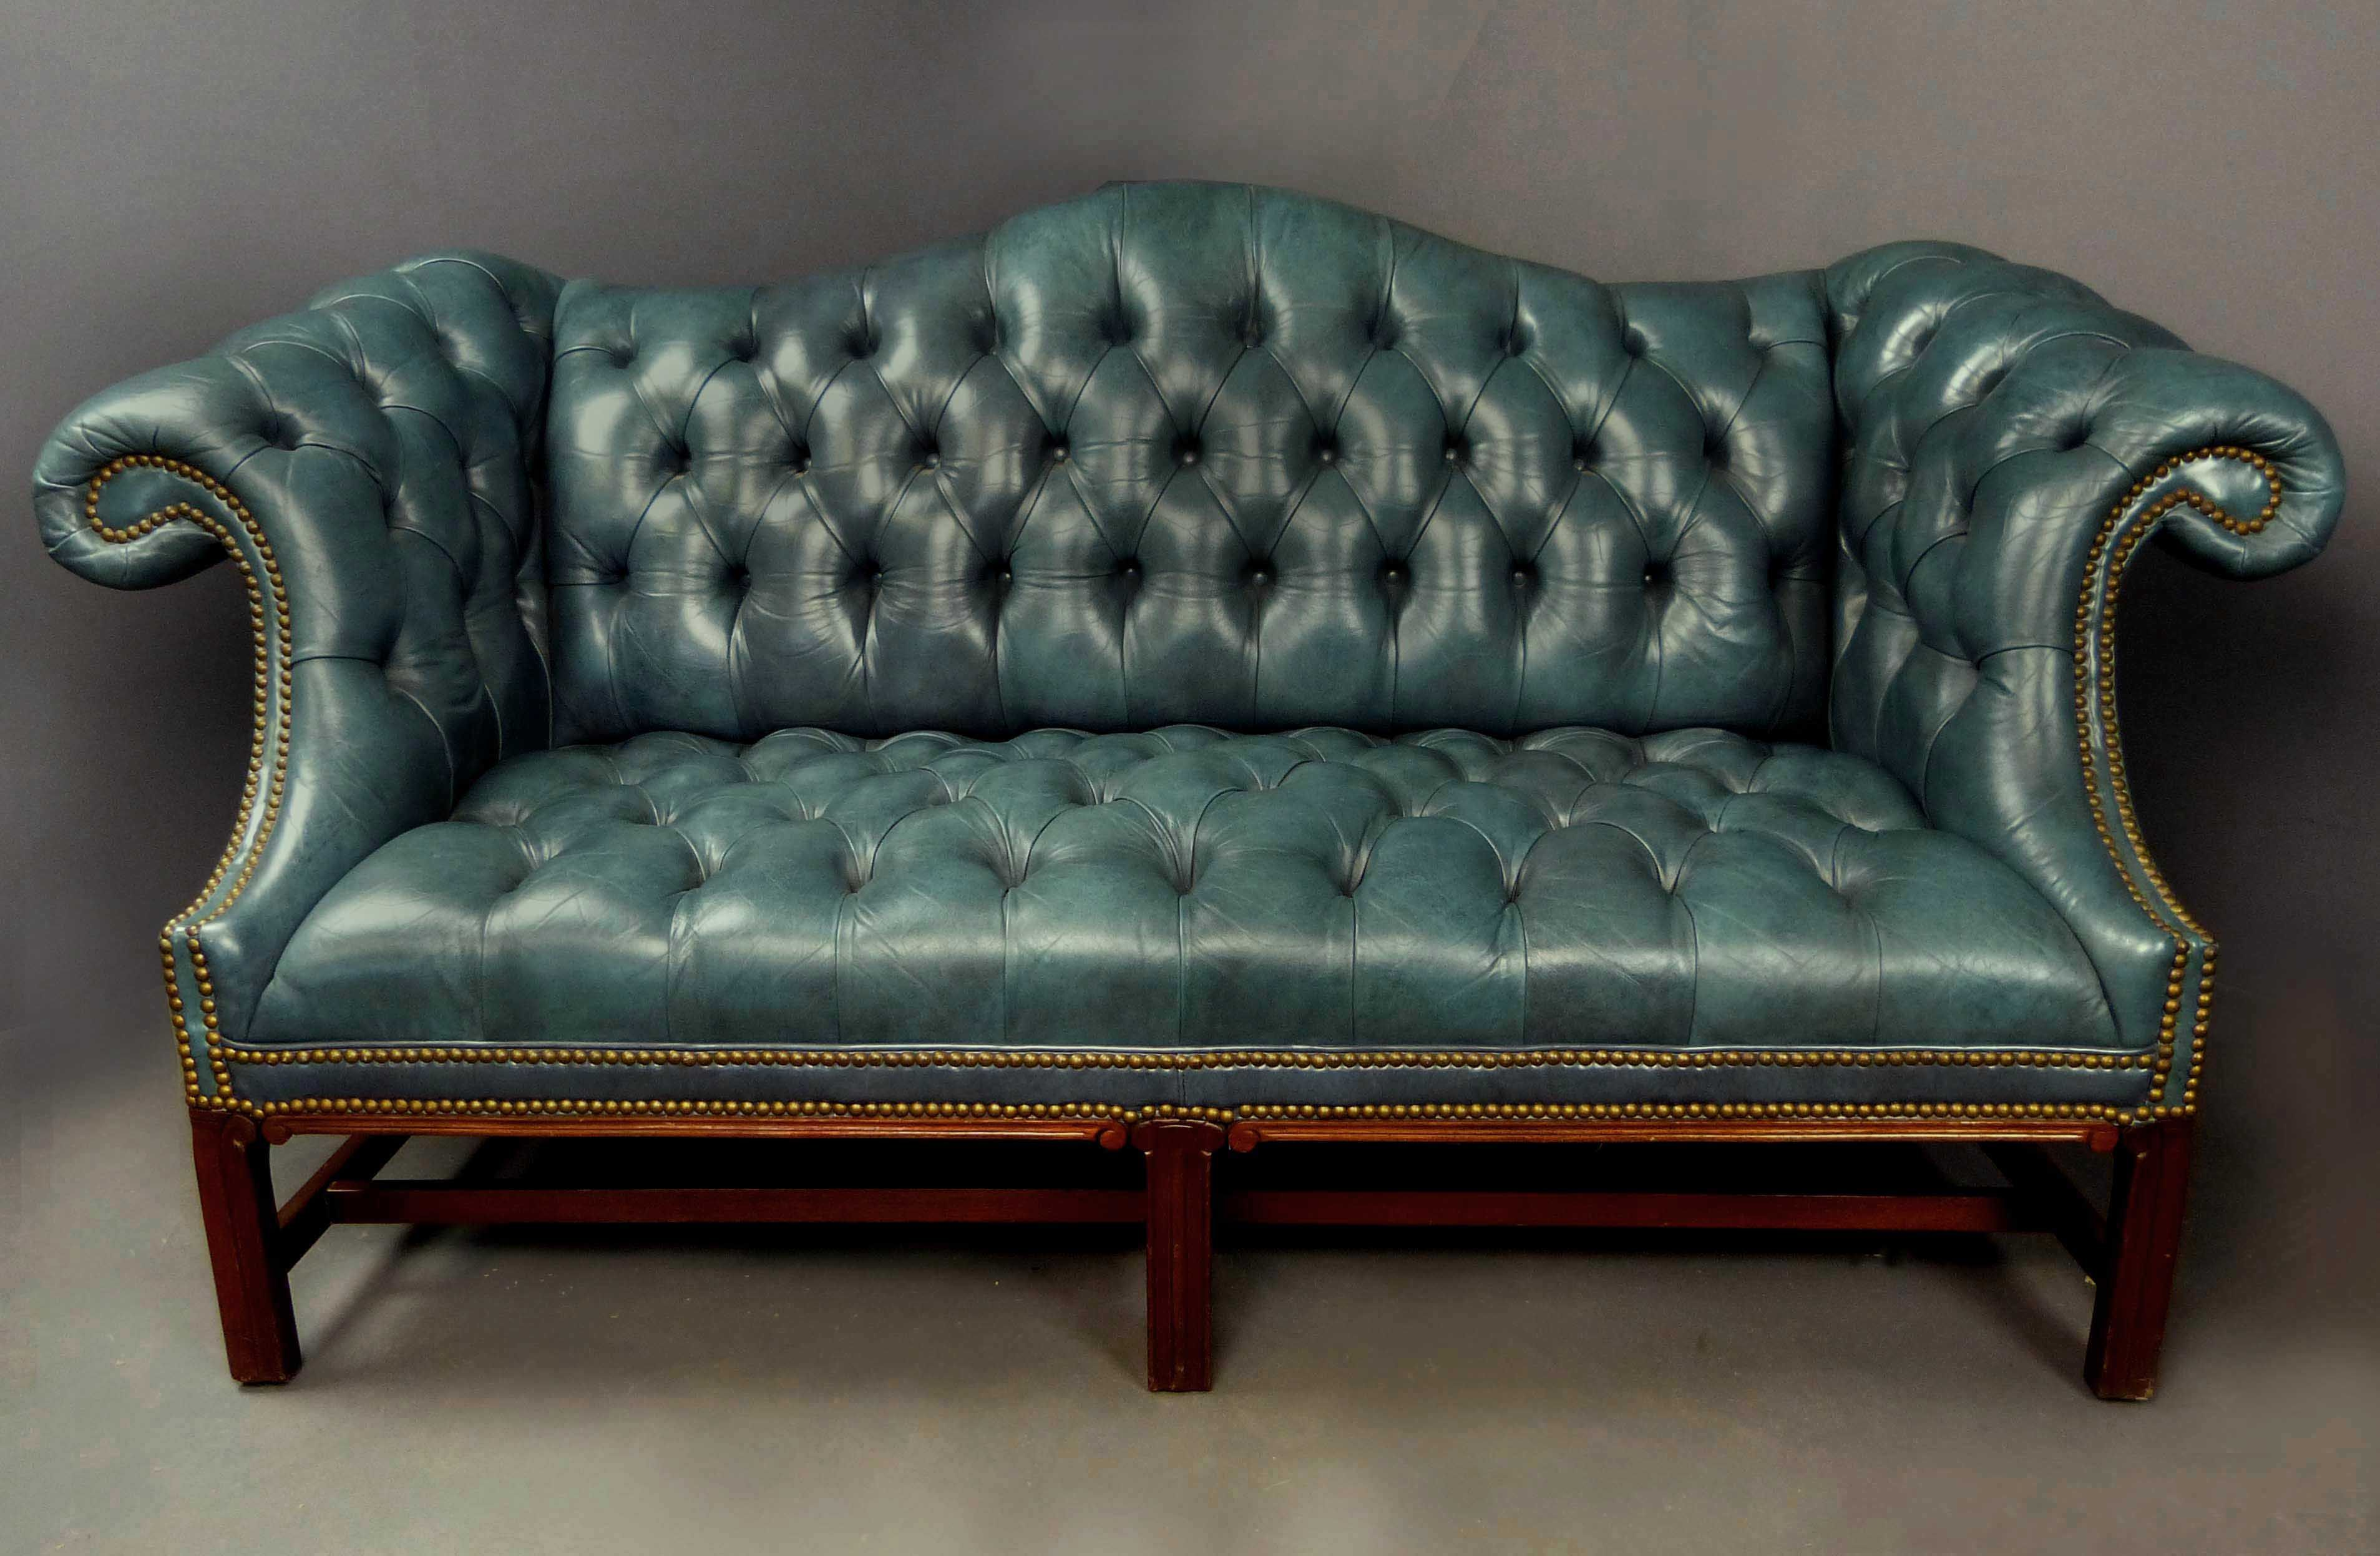 Muebles antiguos armarios antiguos mesas antiguas c modas antiguas sillones antiguos - Sillones antiguos restaurados ...